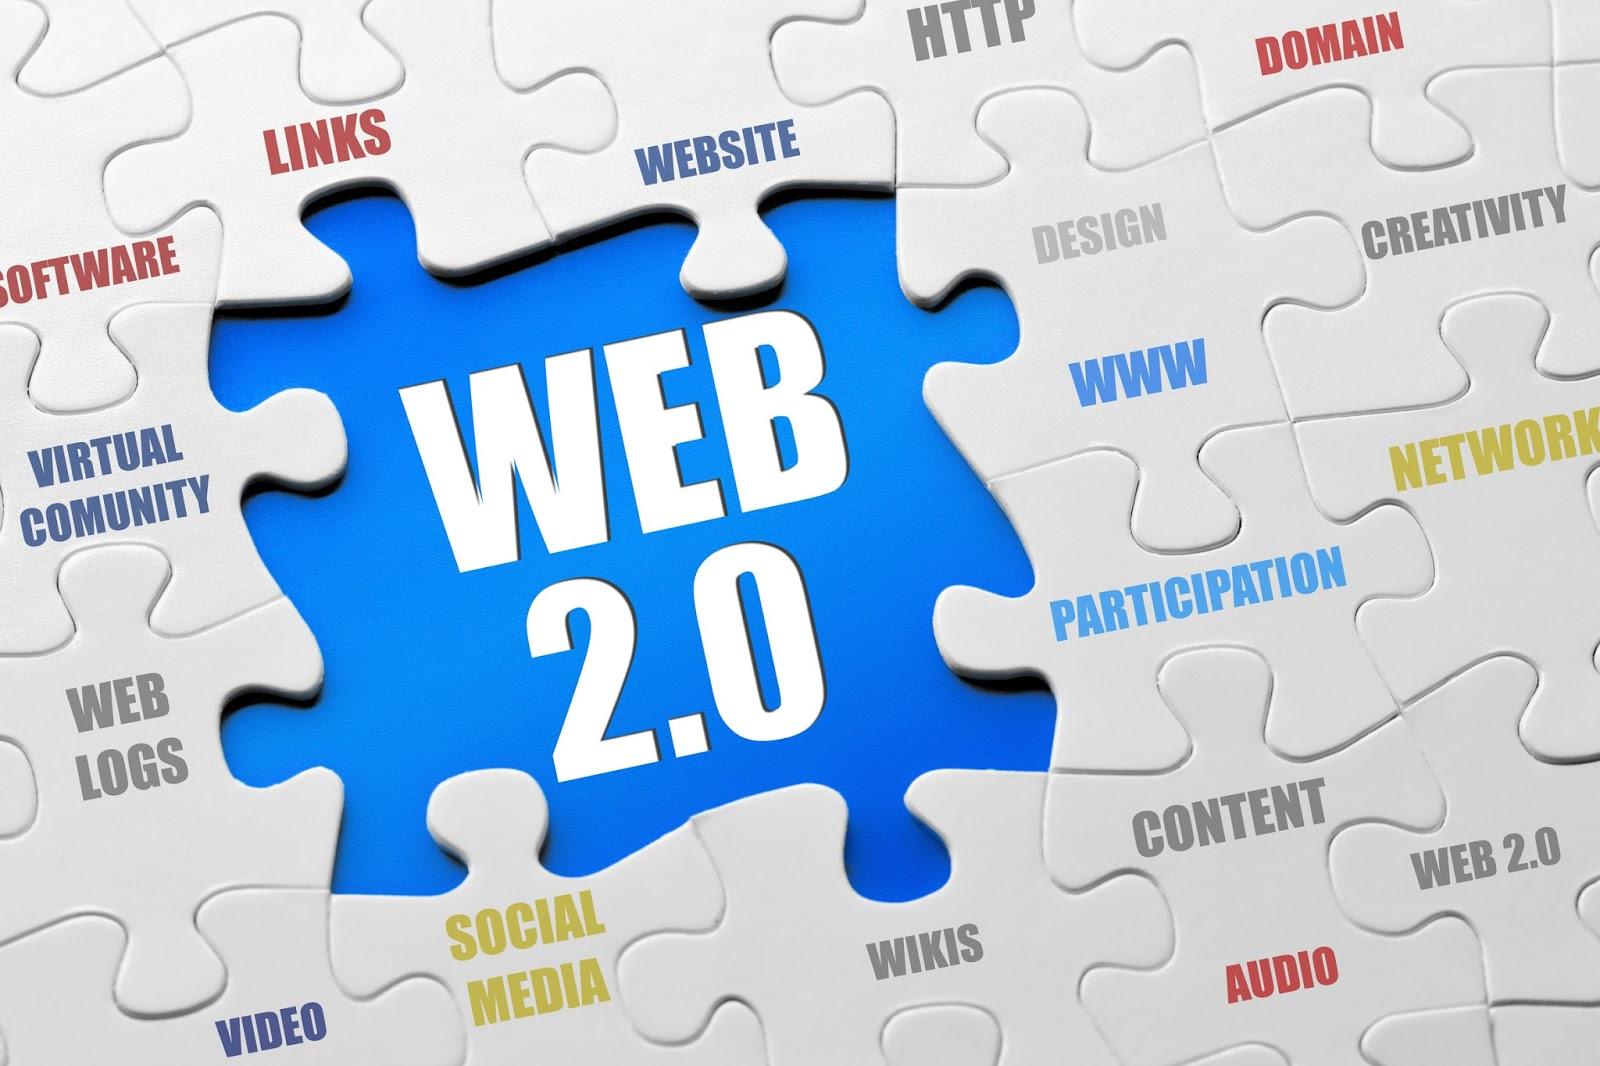 Manually web 2.0 Backlinks + 20 Bookmarking On high PR site